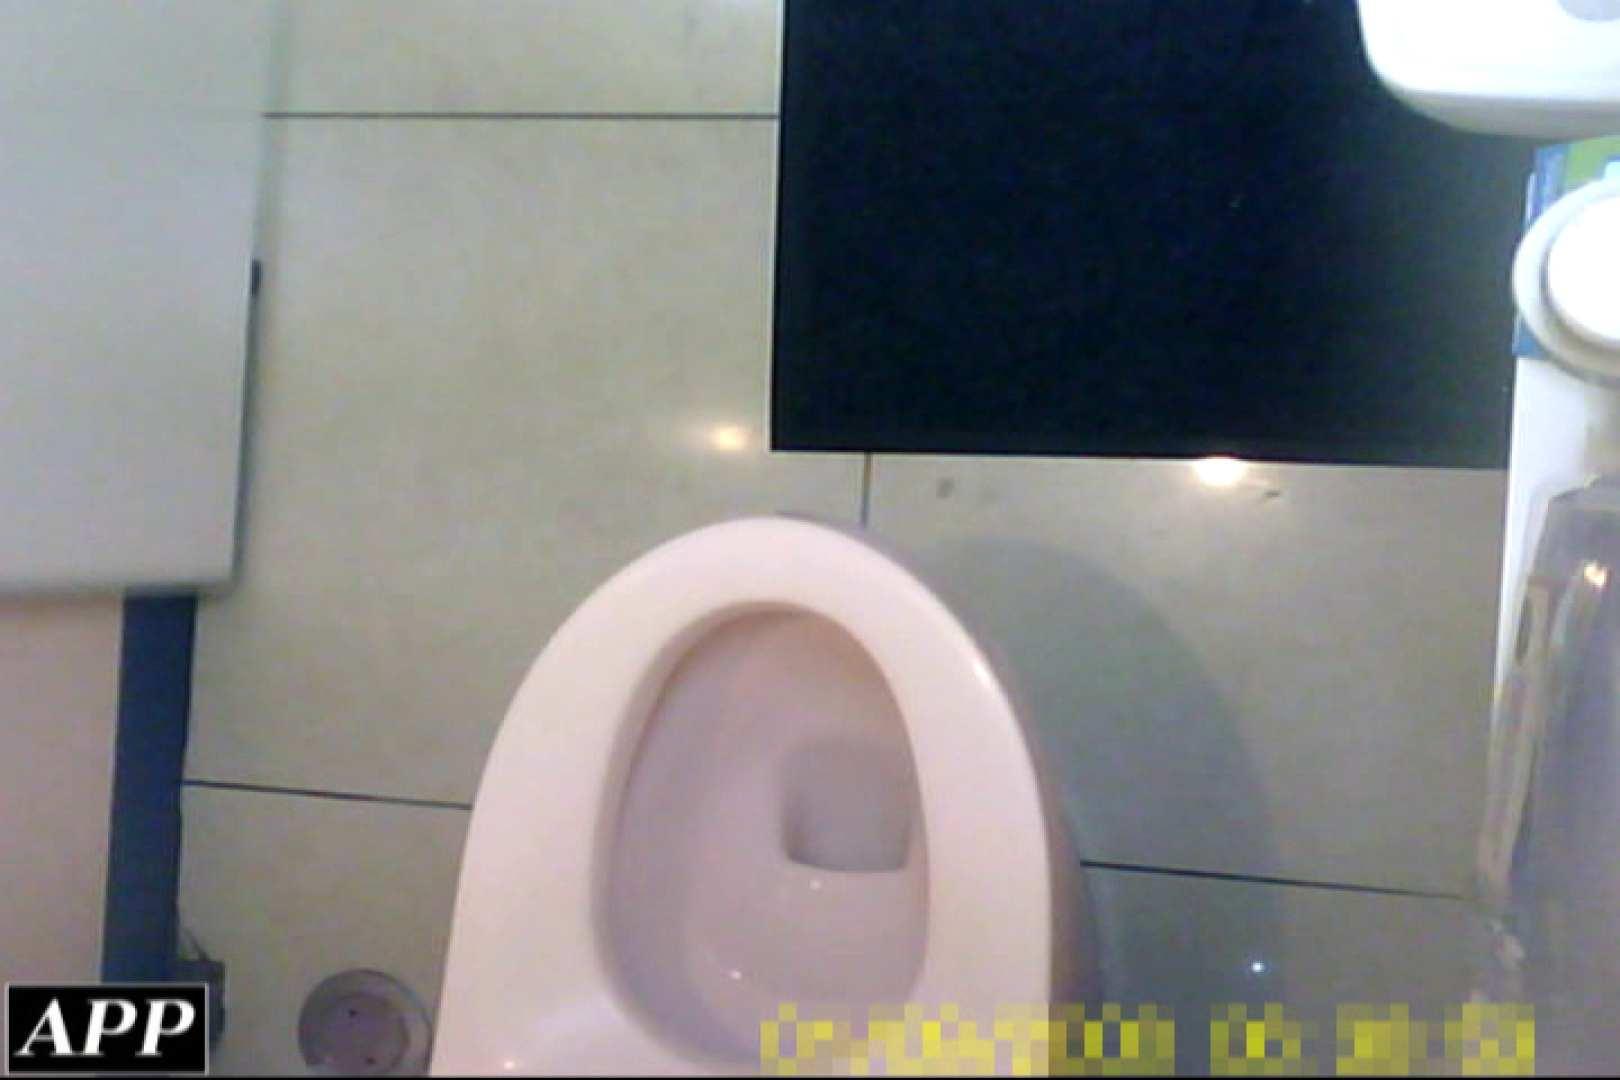 3視点洗面所 vol.72 マンコ SEX無修正画像 104枚 54